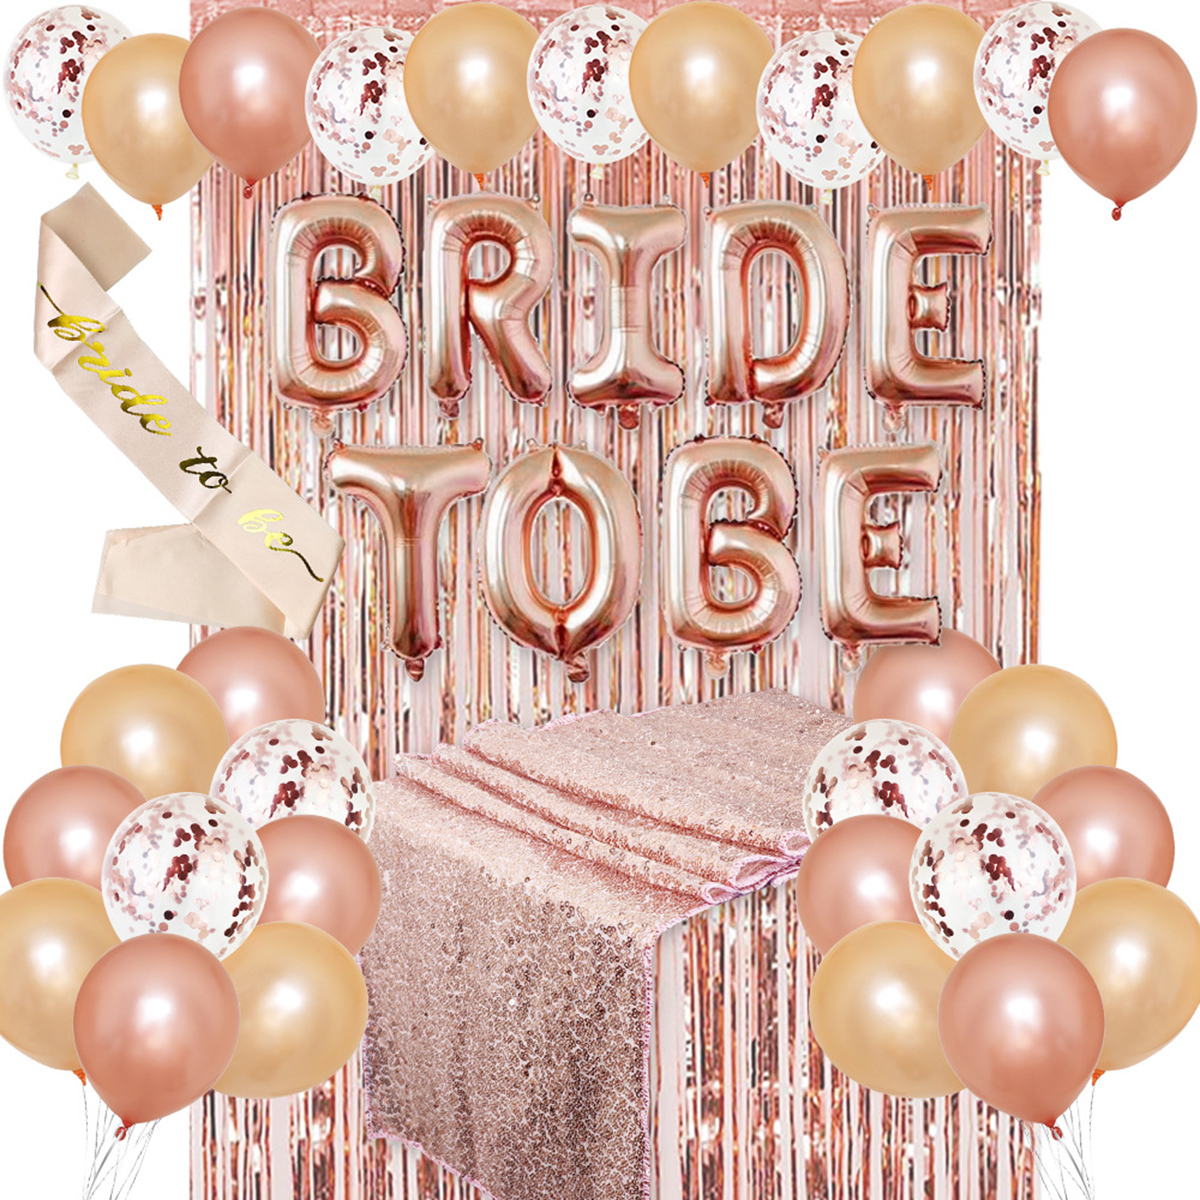 2019 Rose Gold Foil Balloons Kit Party Decoration Bride Shoulder Strap For Bachelorette Party Wedding Decor Bridal Shower Supply